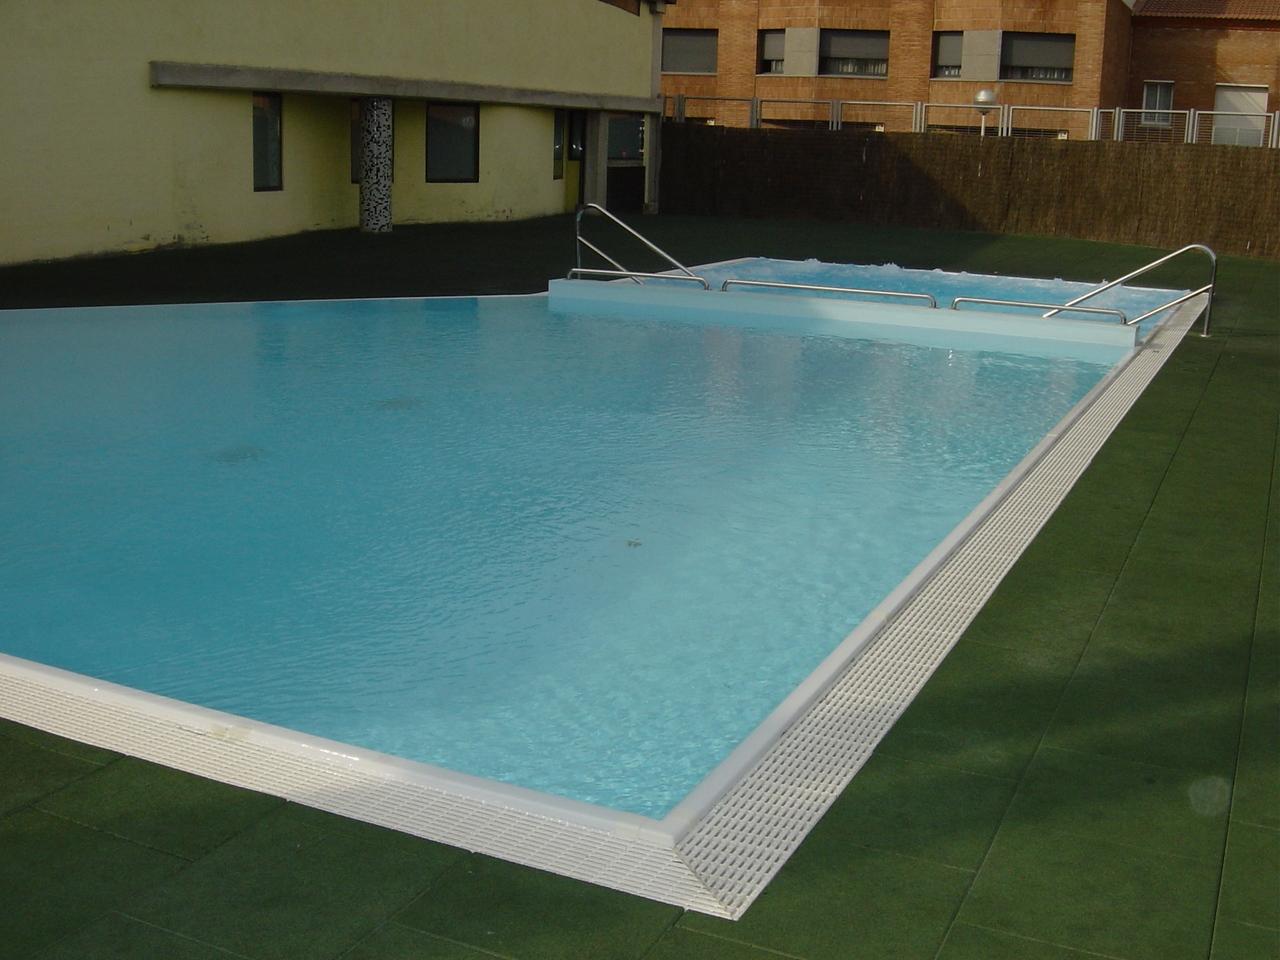 Jacuzzi piscina exterior piscinas con jacuzzi piscina for Jacuzzi piscina exterior